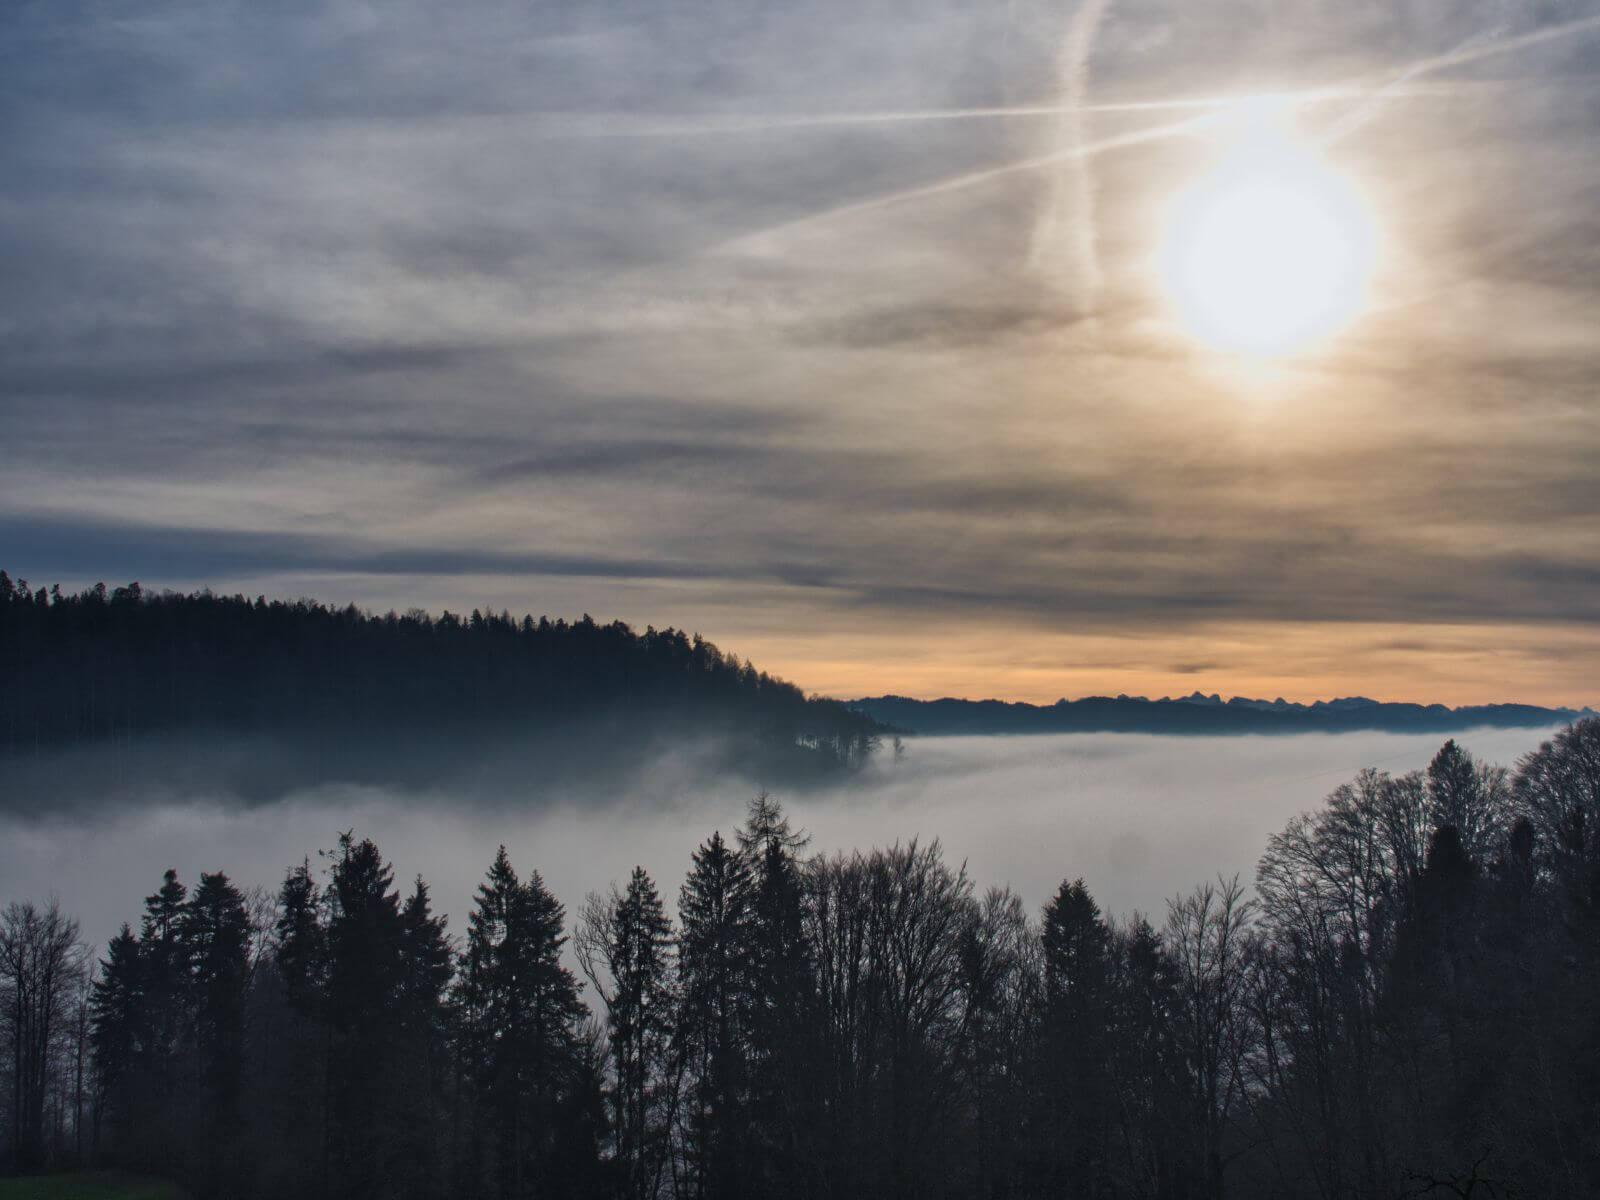 Nebelmeer at Hasenstrick - Sea of Fog aboove Switzerland